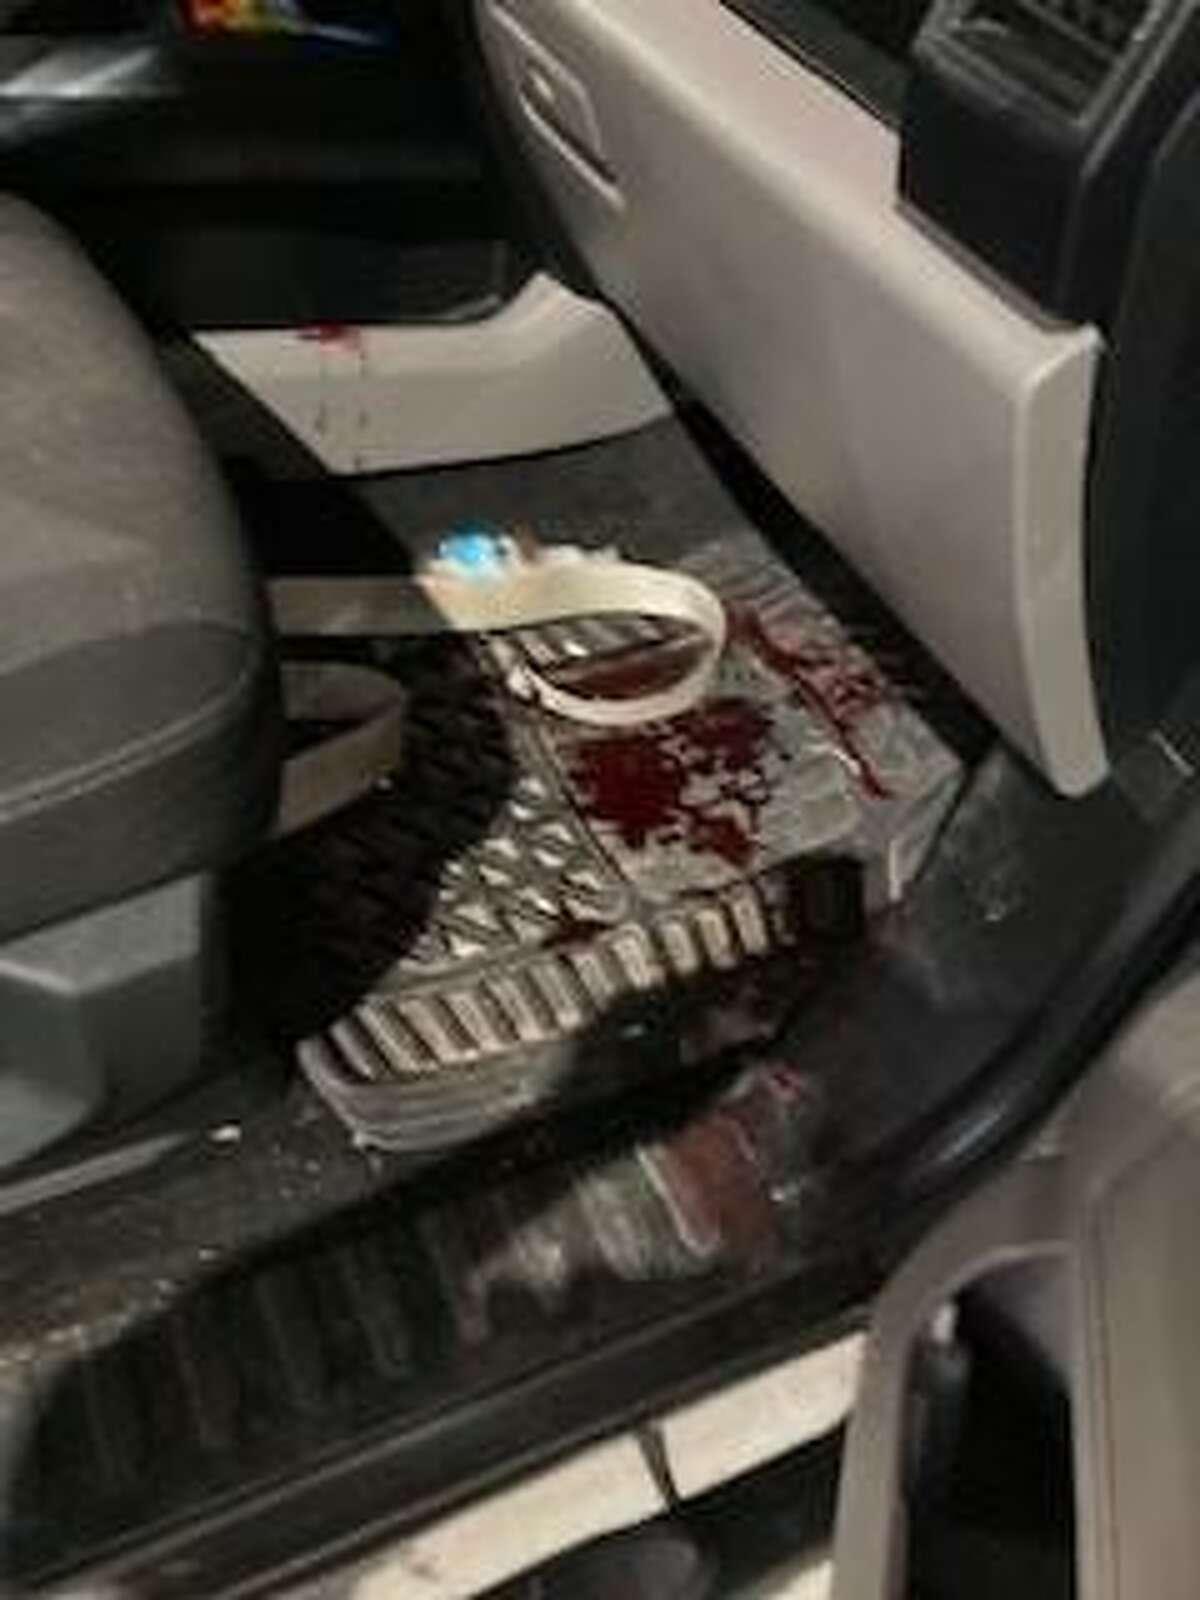 U.S. Border Patrol agents rendered aid to an accidental gunshot victim on Saturday, July 17, 2021.